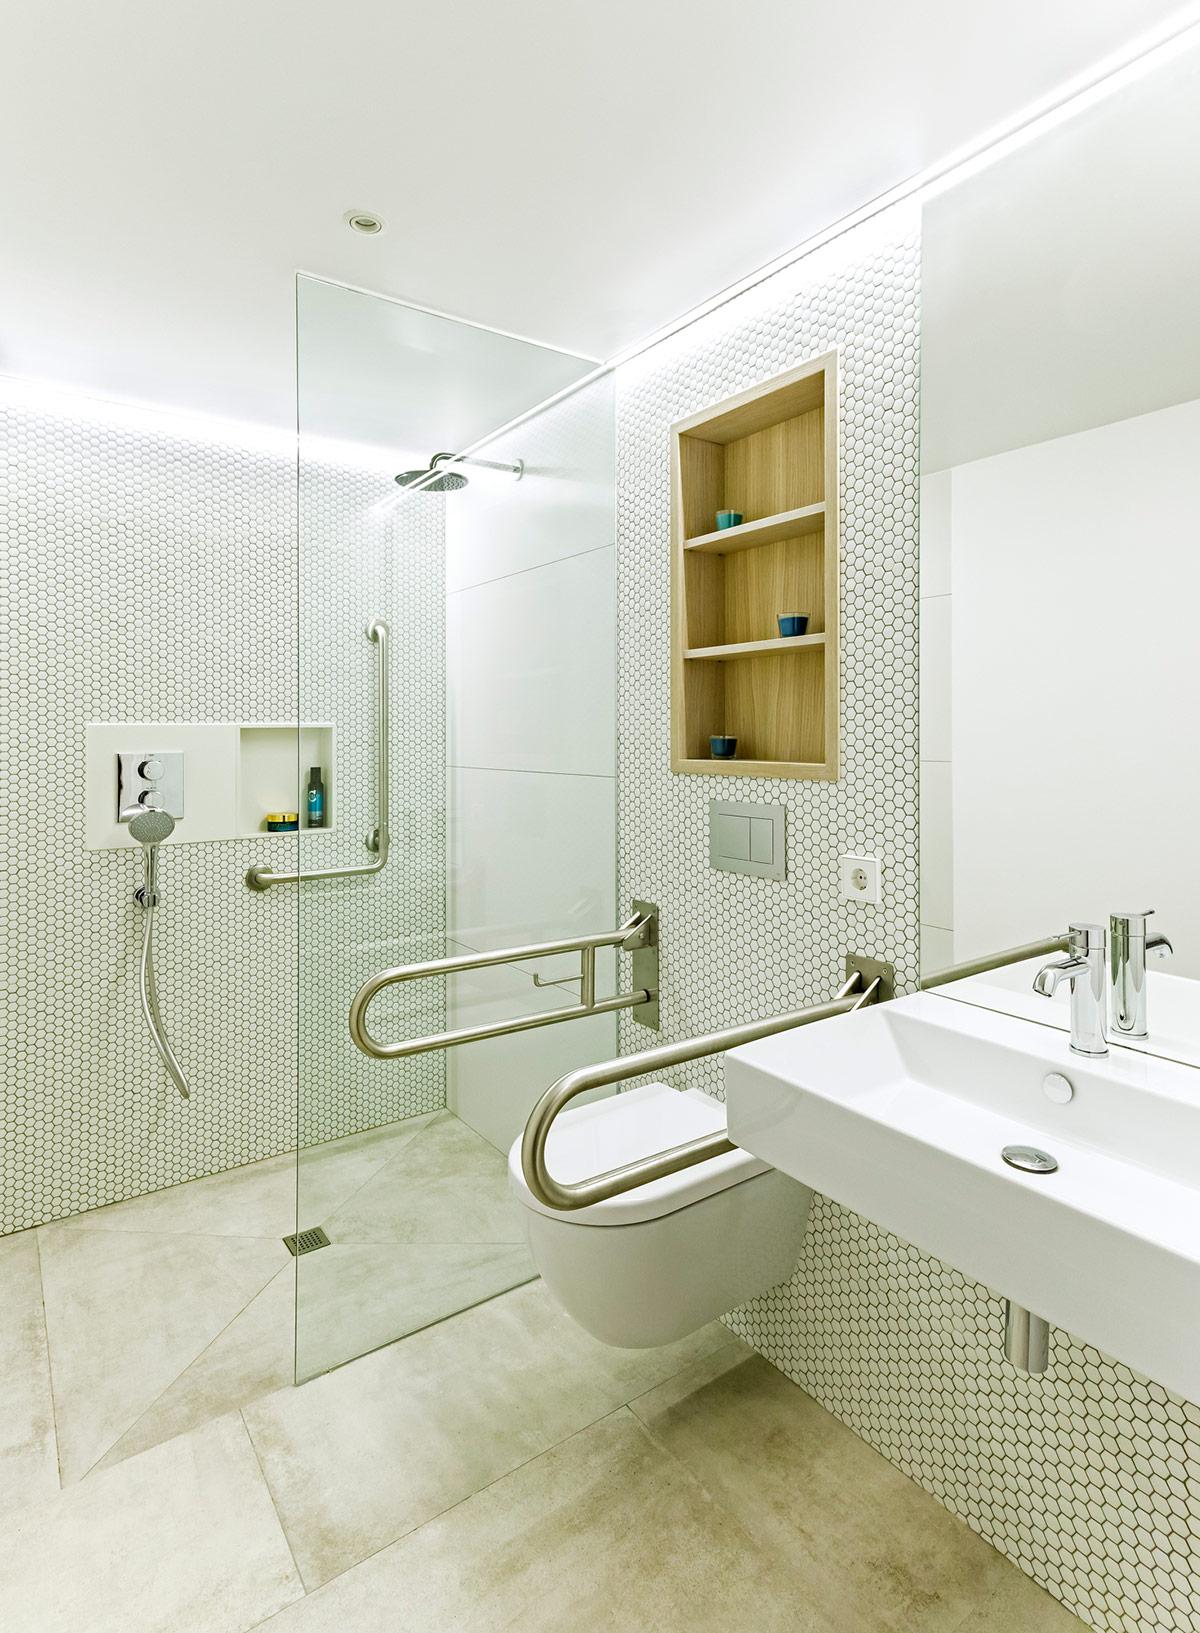 La Escala disable friendly bathroom with mosaic